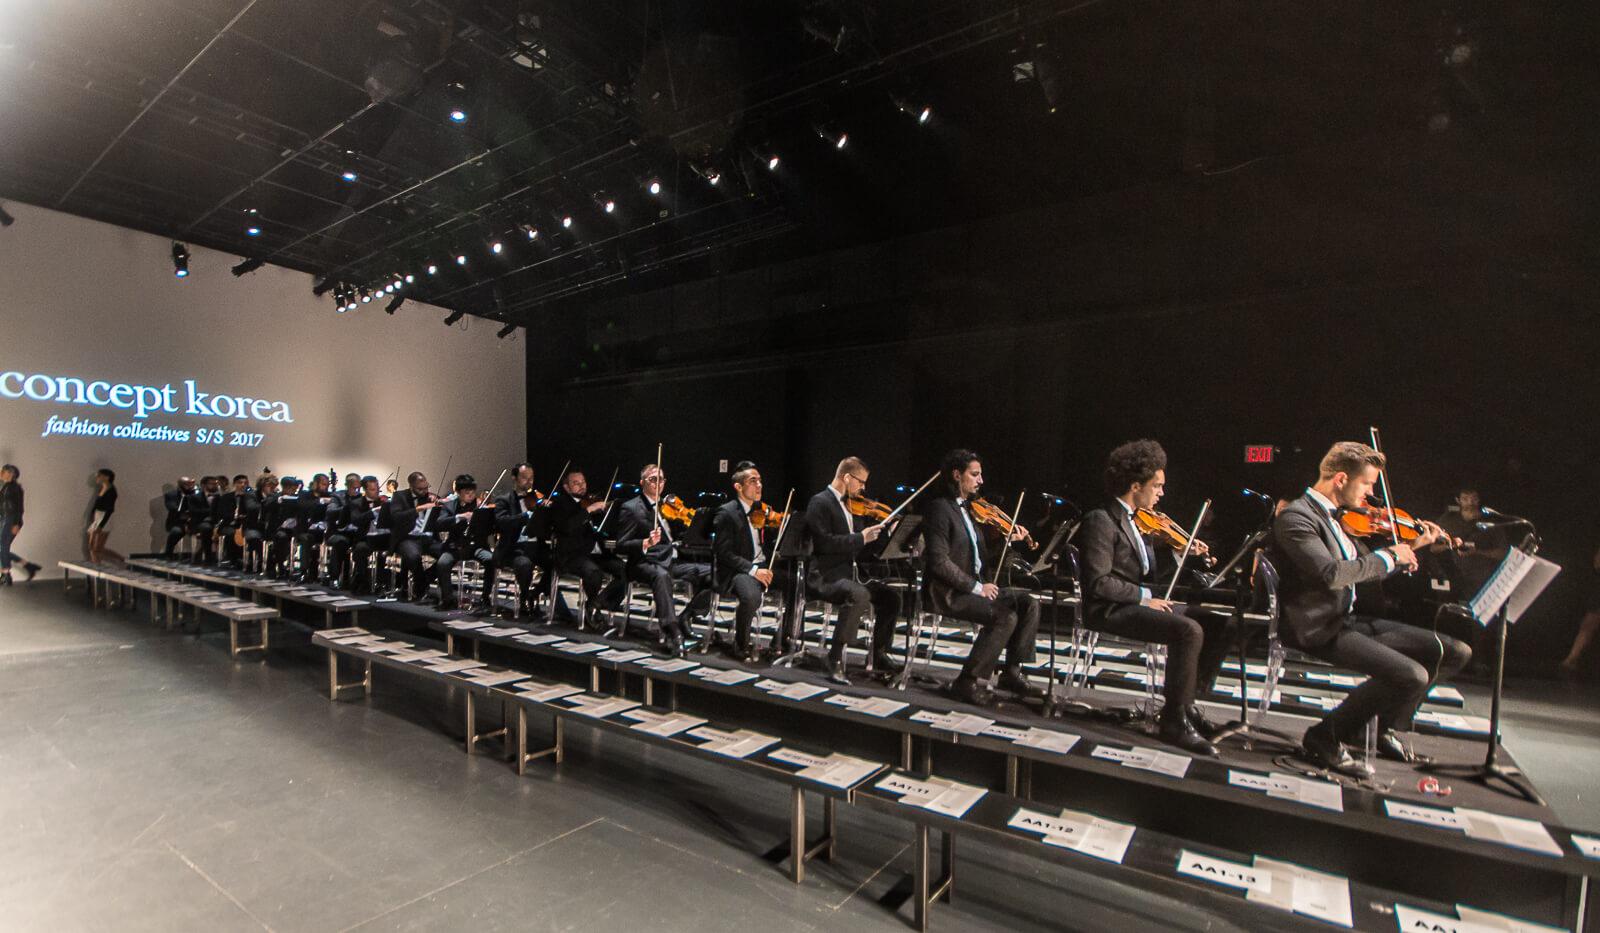 New York Fashion Week String Orchestra